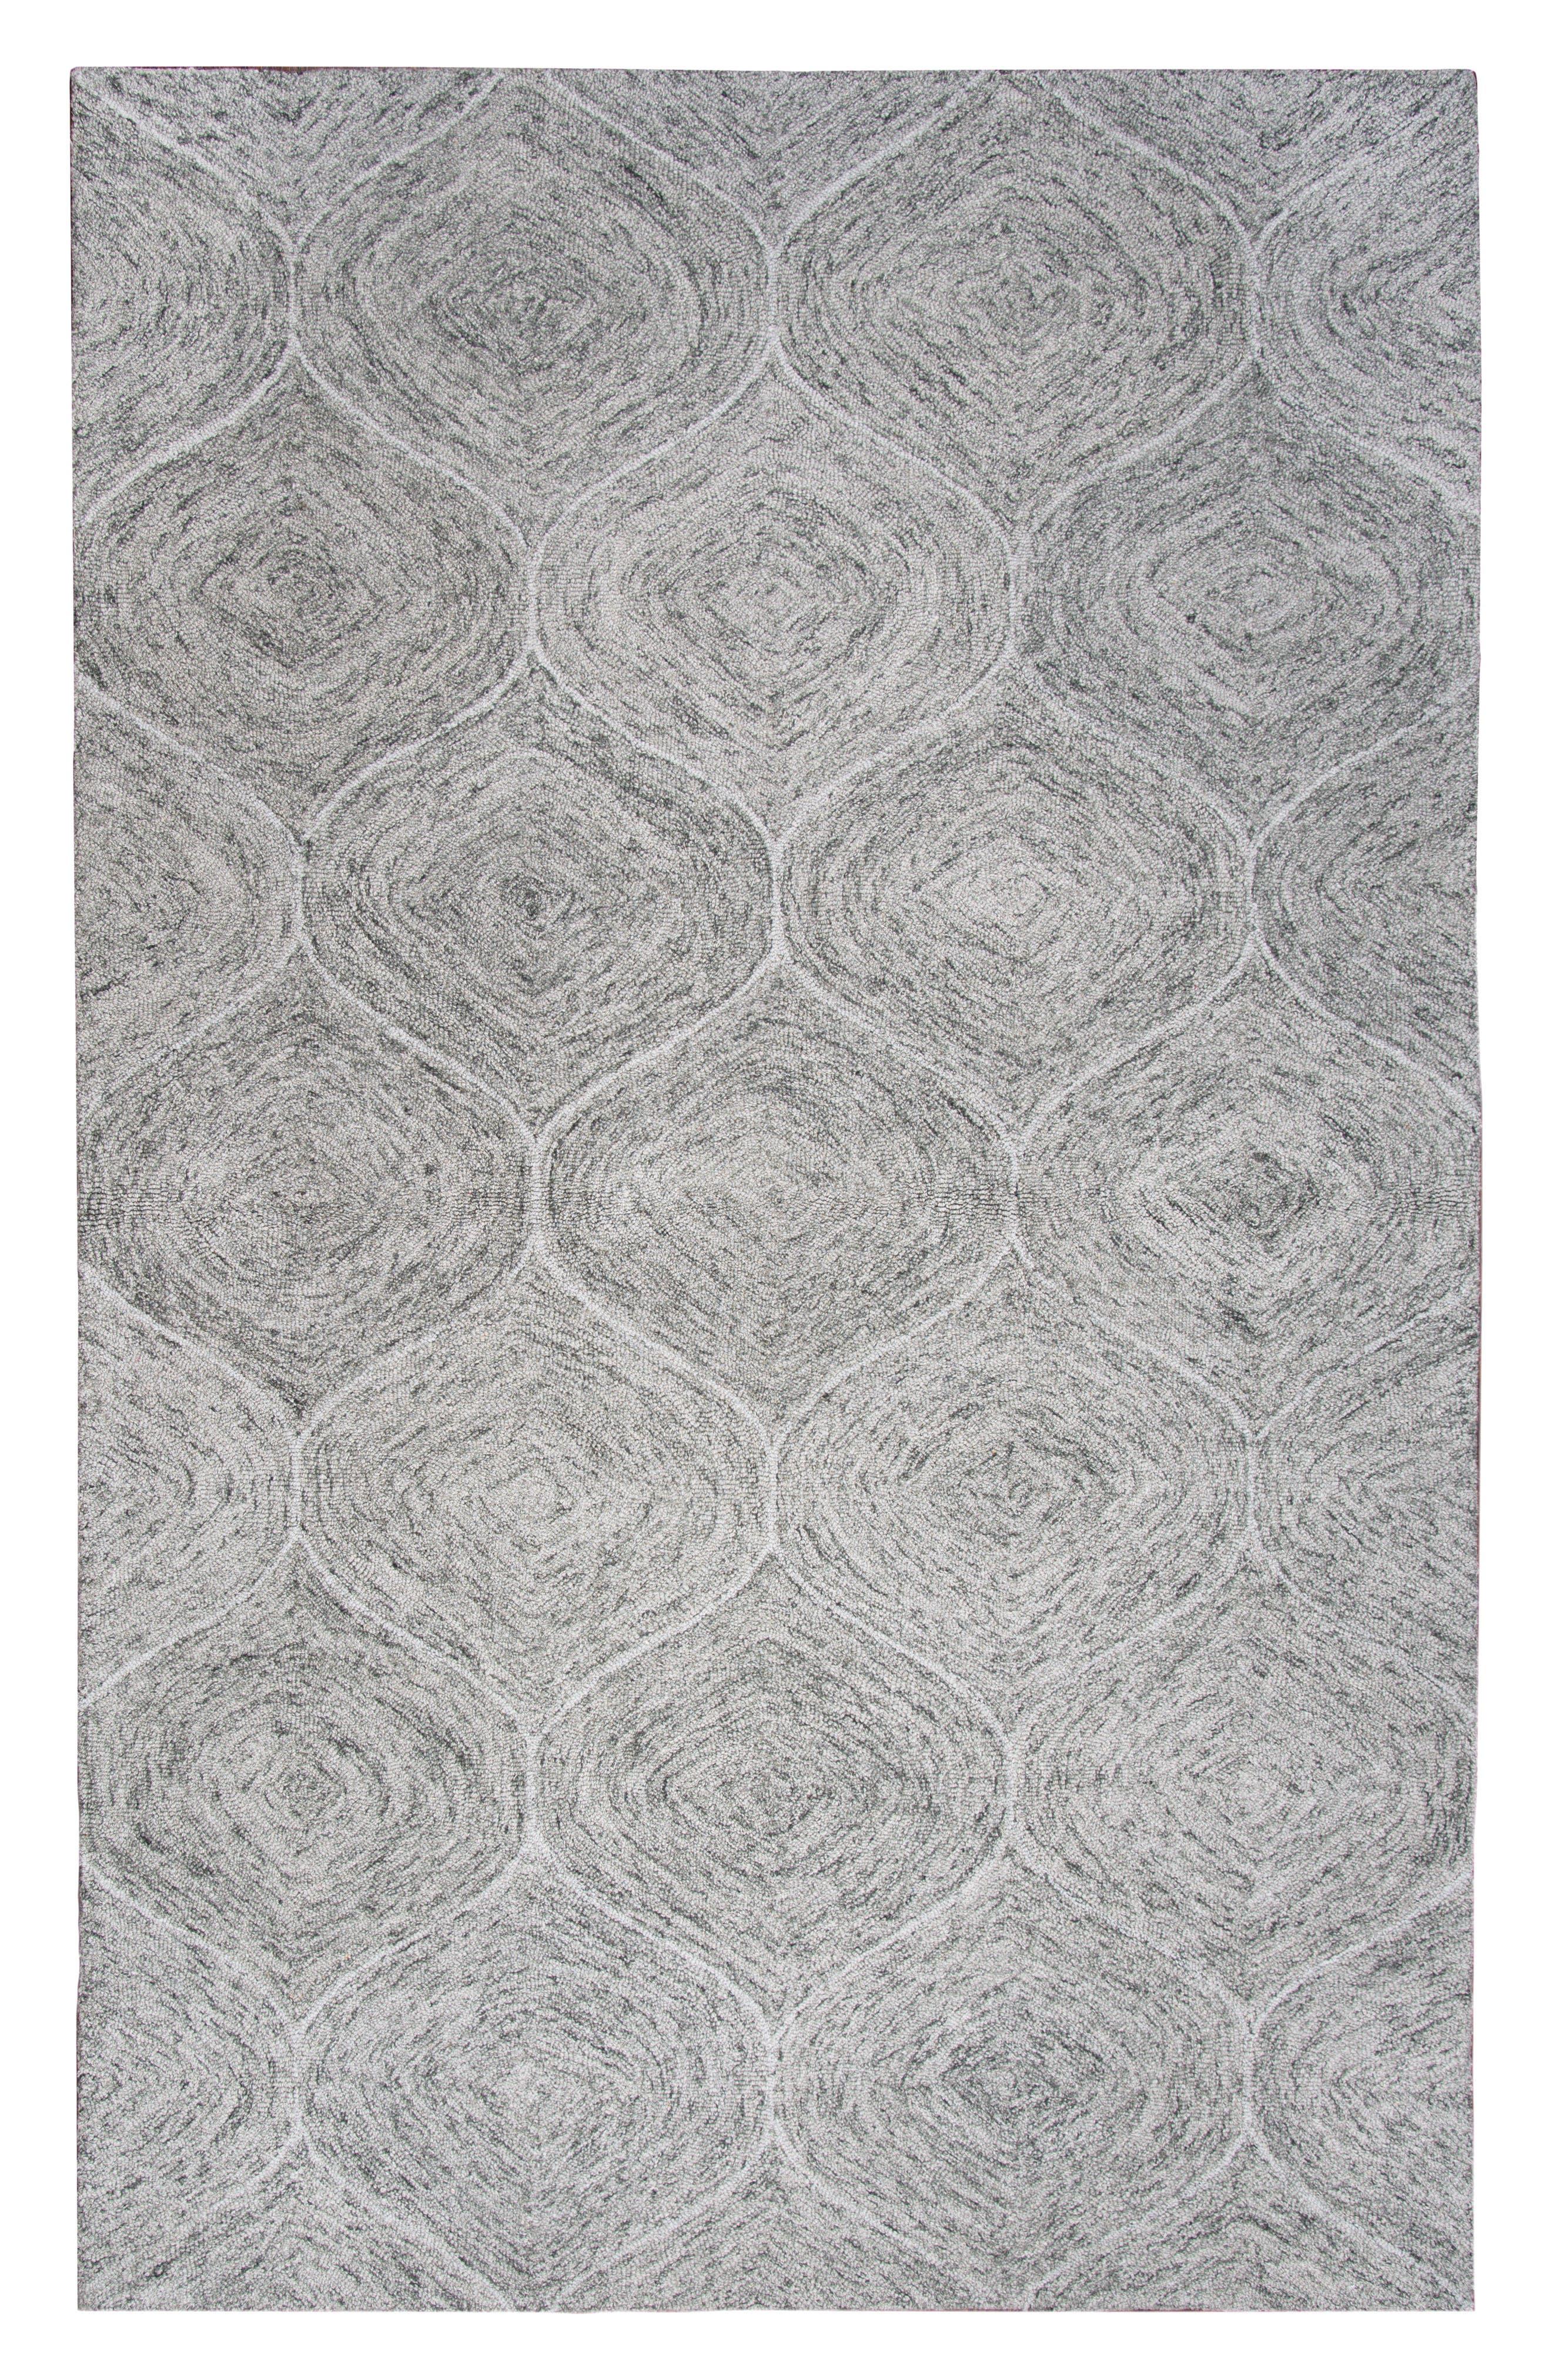 Irregular Diamond Hand Tufted Wool Area Rug,                             Main thumbnail 4, color,